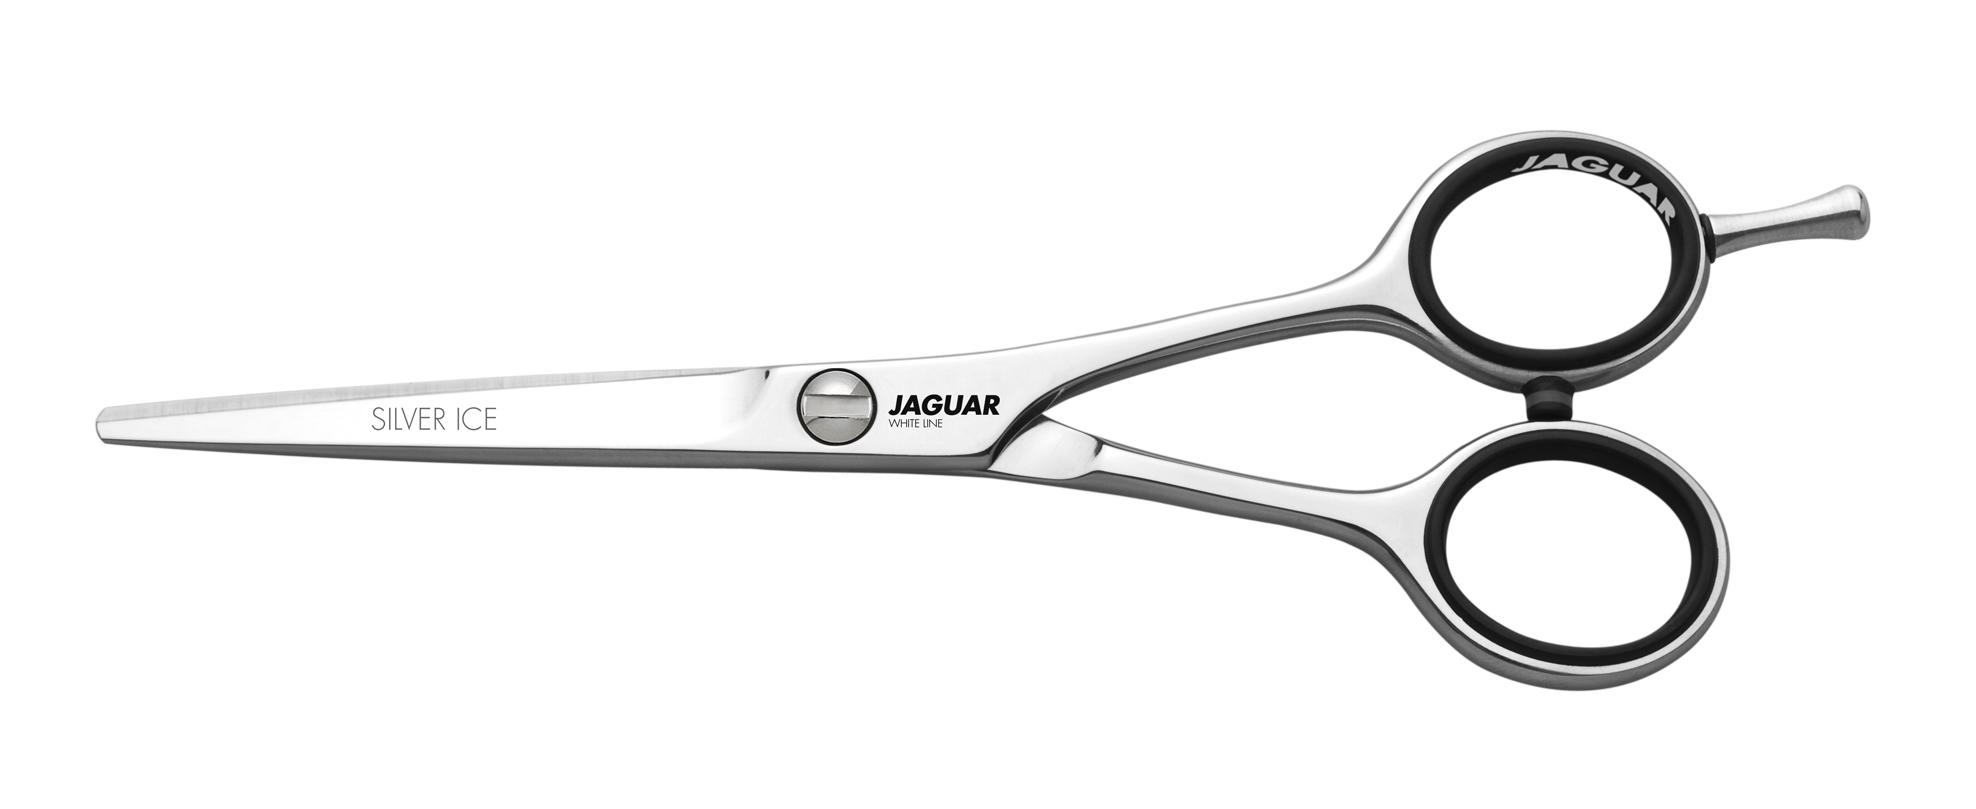 JAGUAR Ножницы Jaguar Silver Ice 6,5'(16,5cm)WL